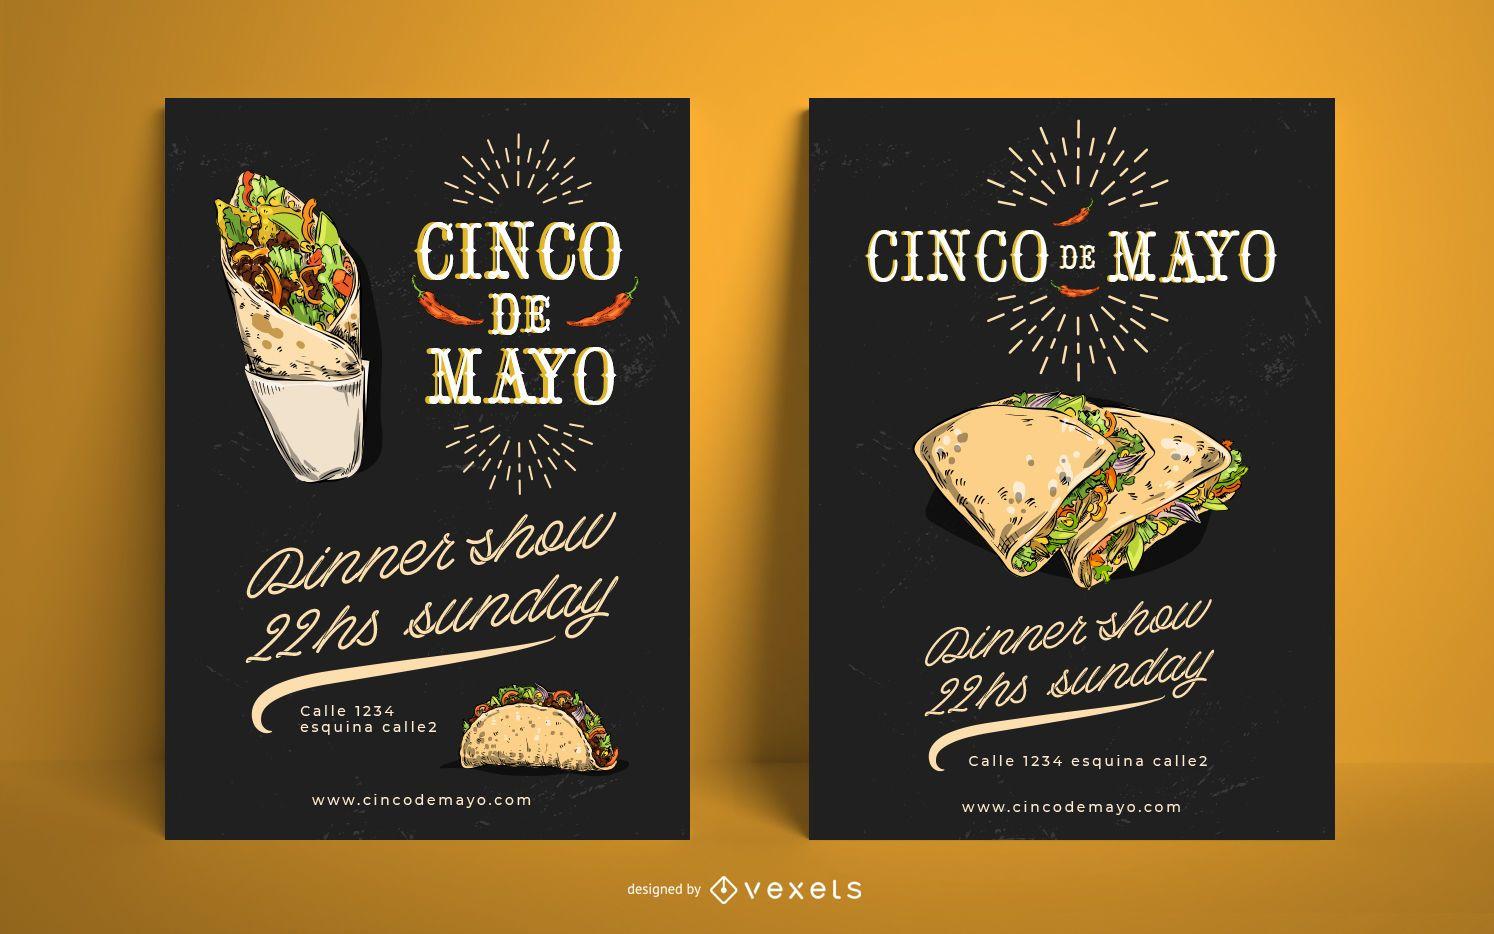 Cinco de mayo food poster template